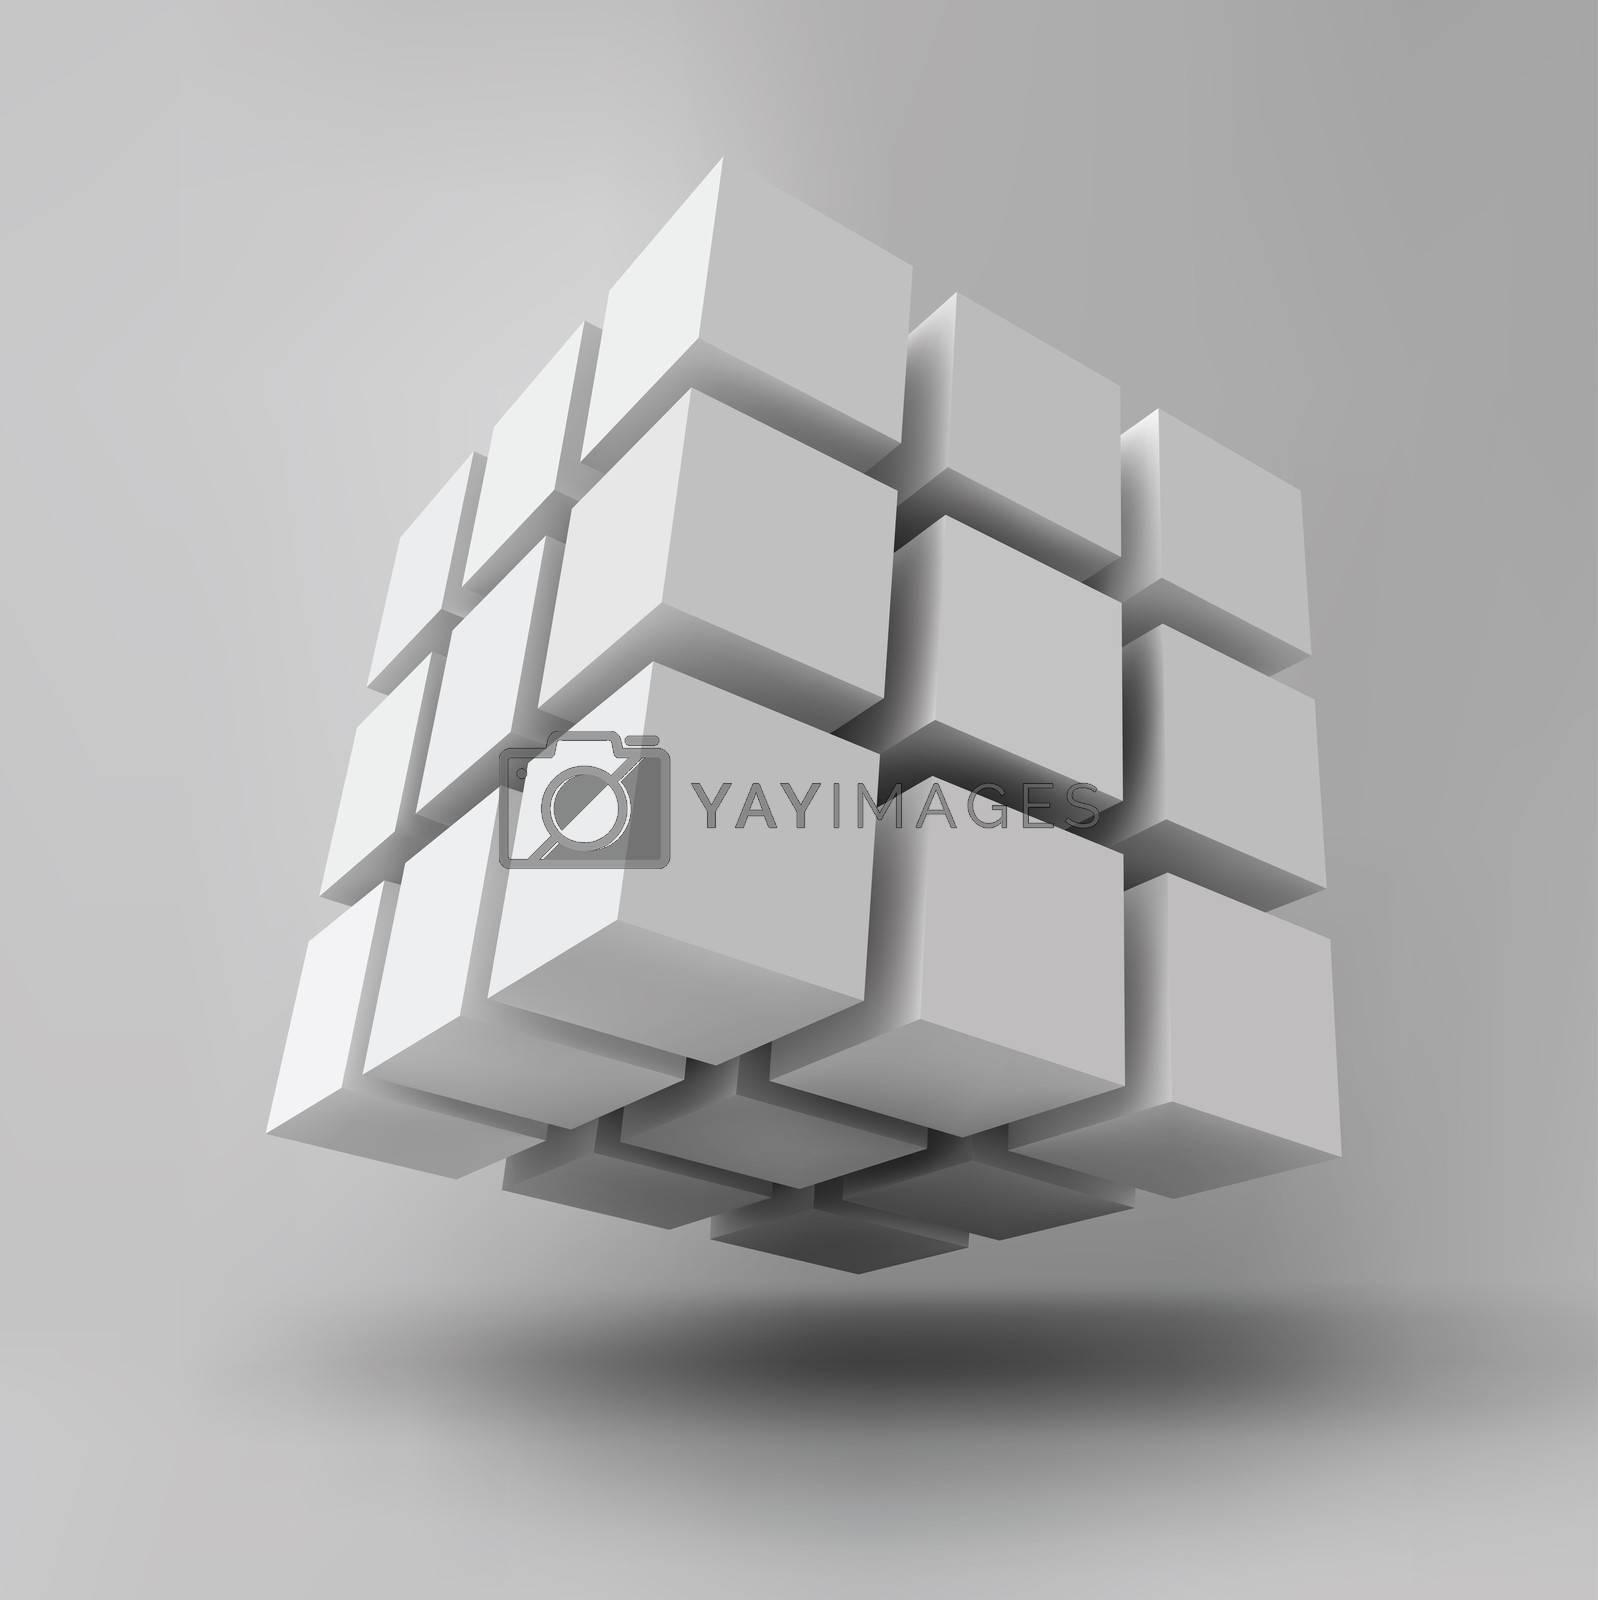 2D computer illustration